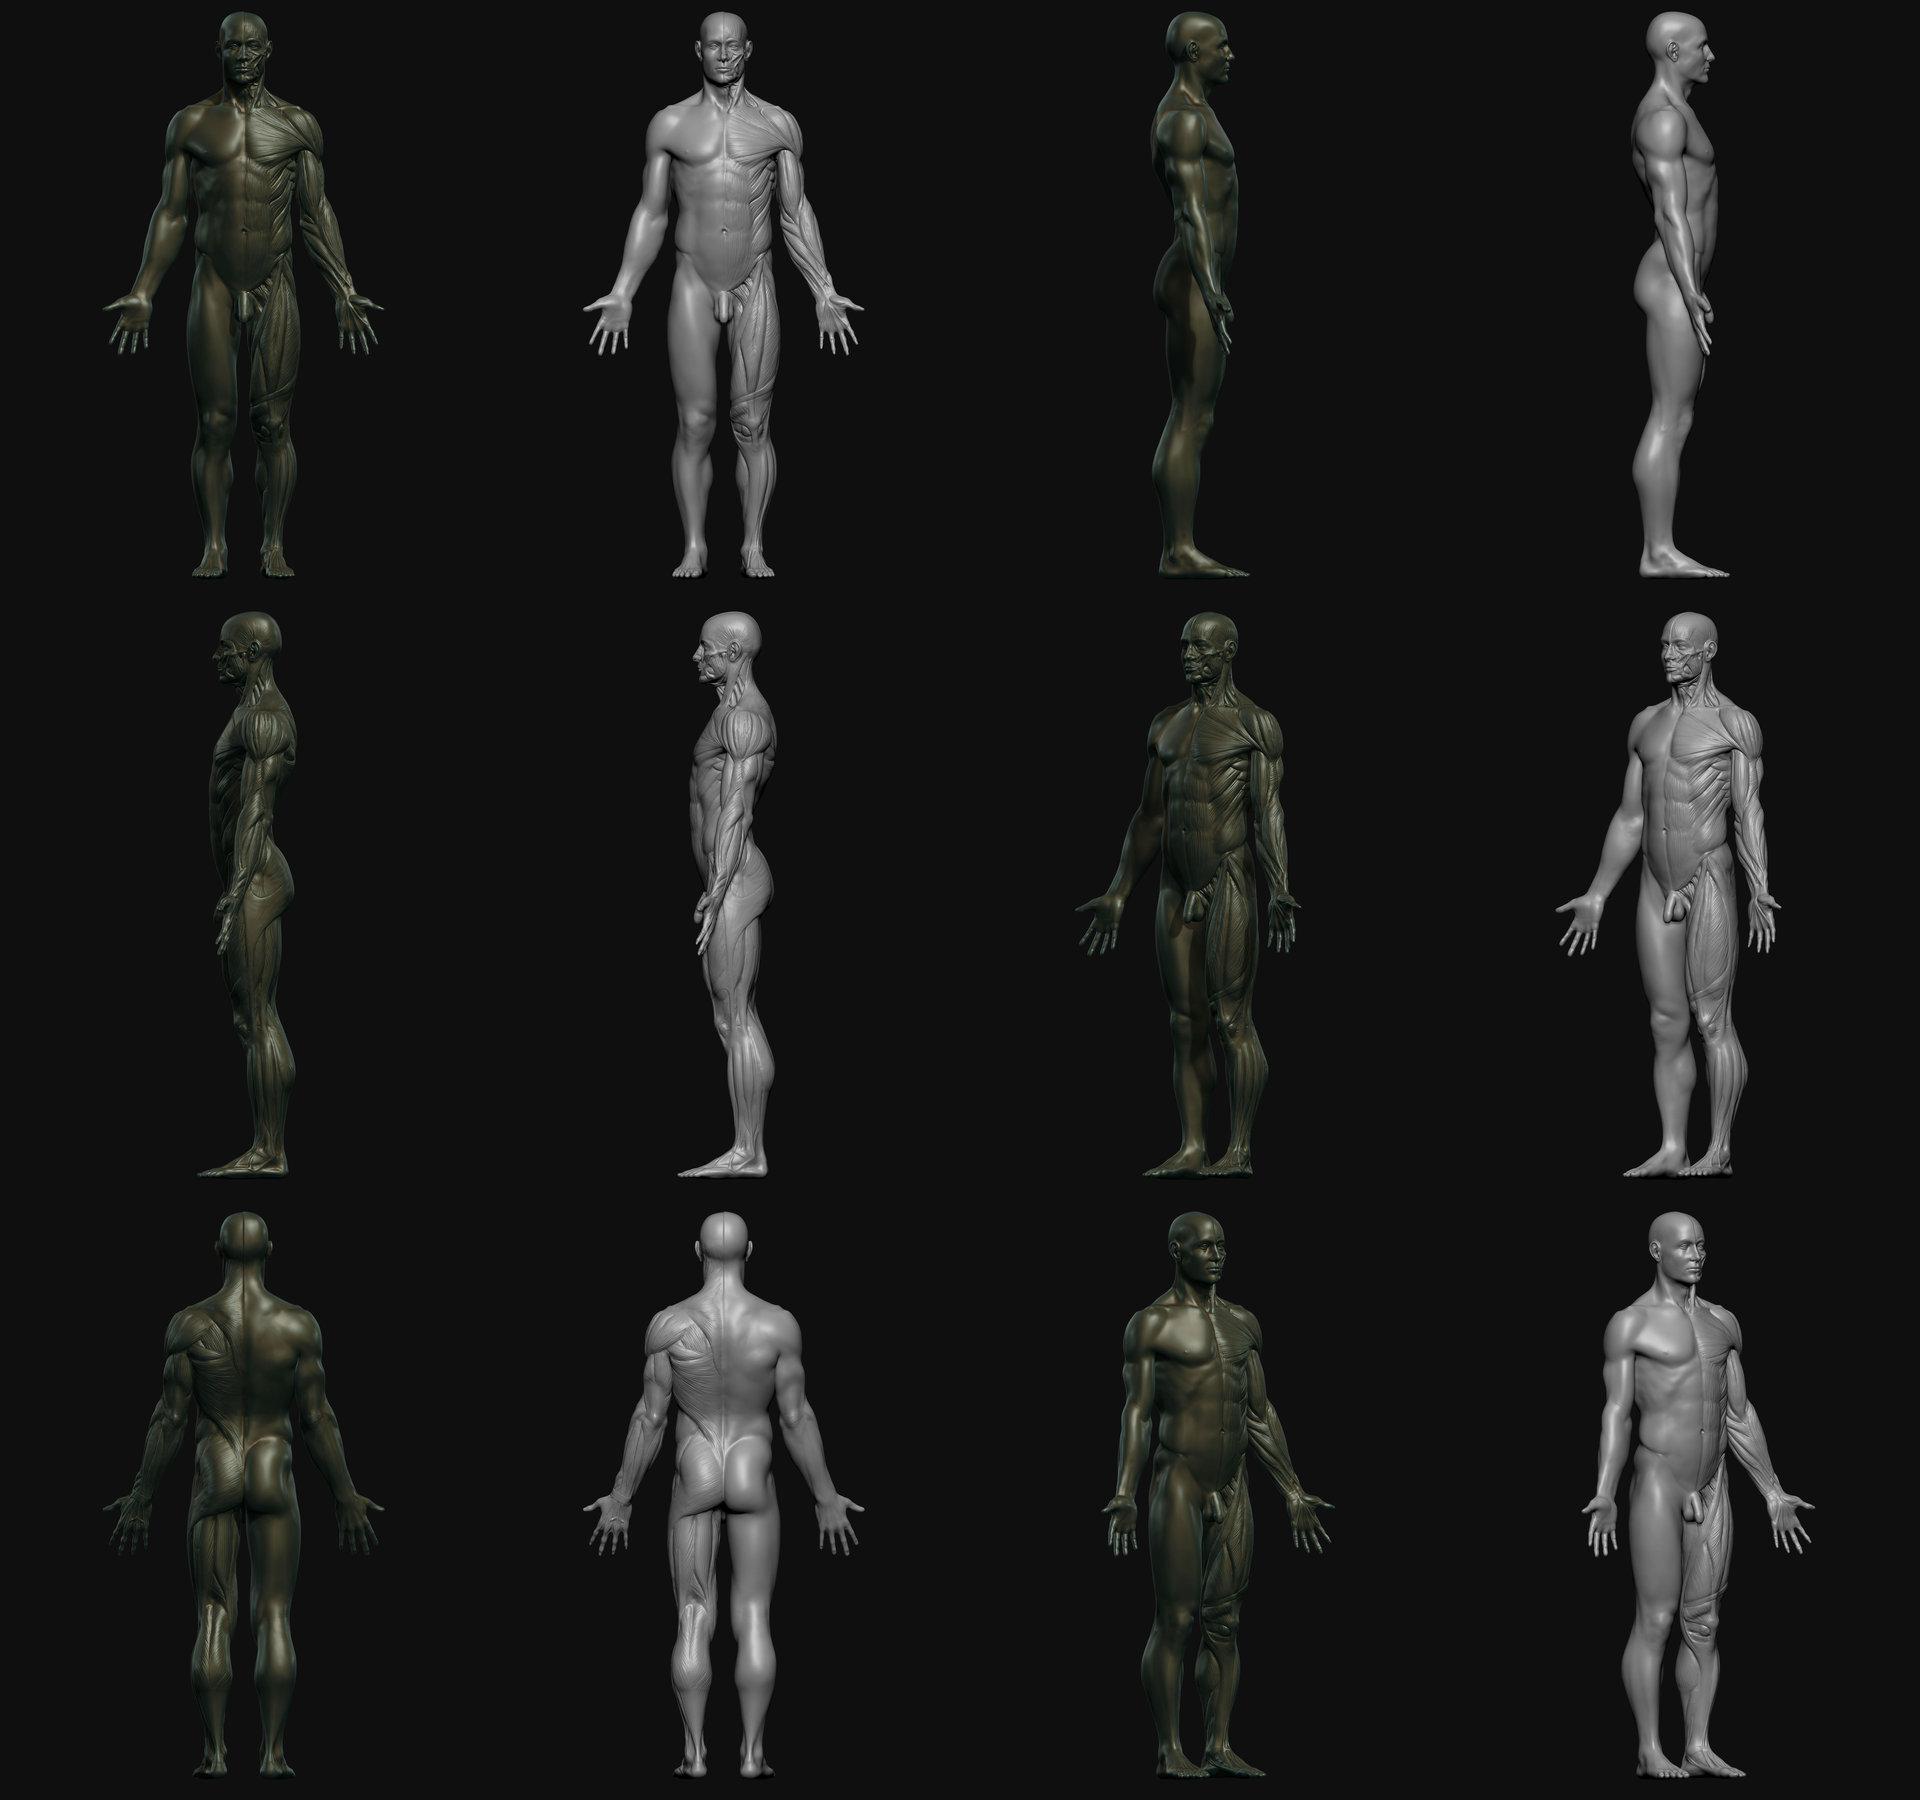 ArtStation - 3D Total Male Anatomy Figure, Federico Scarbini